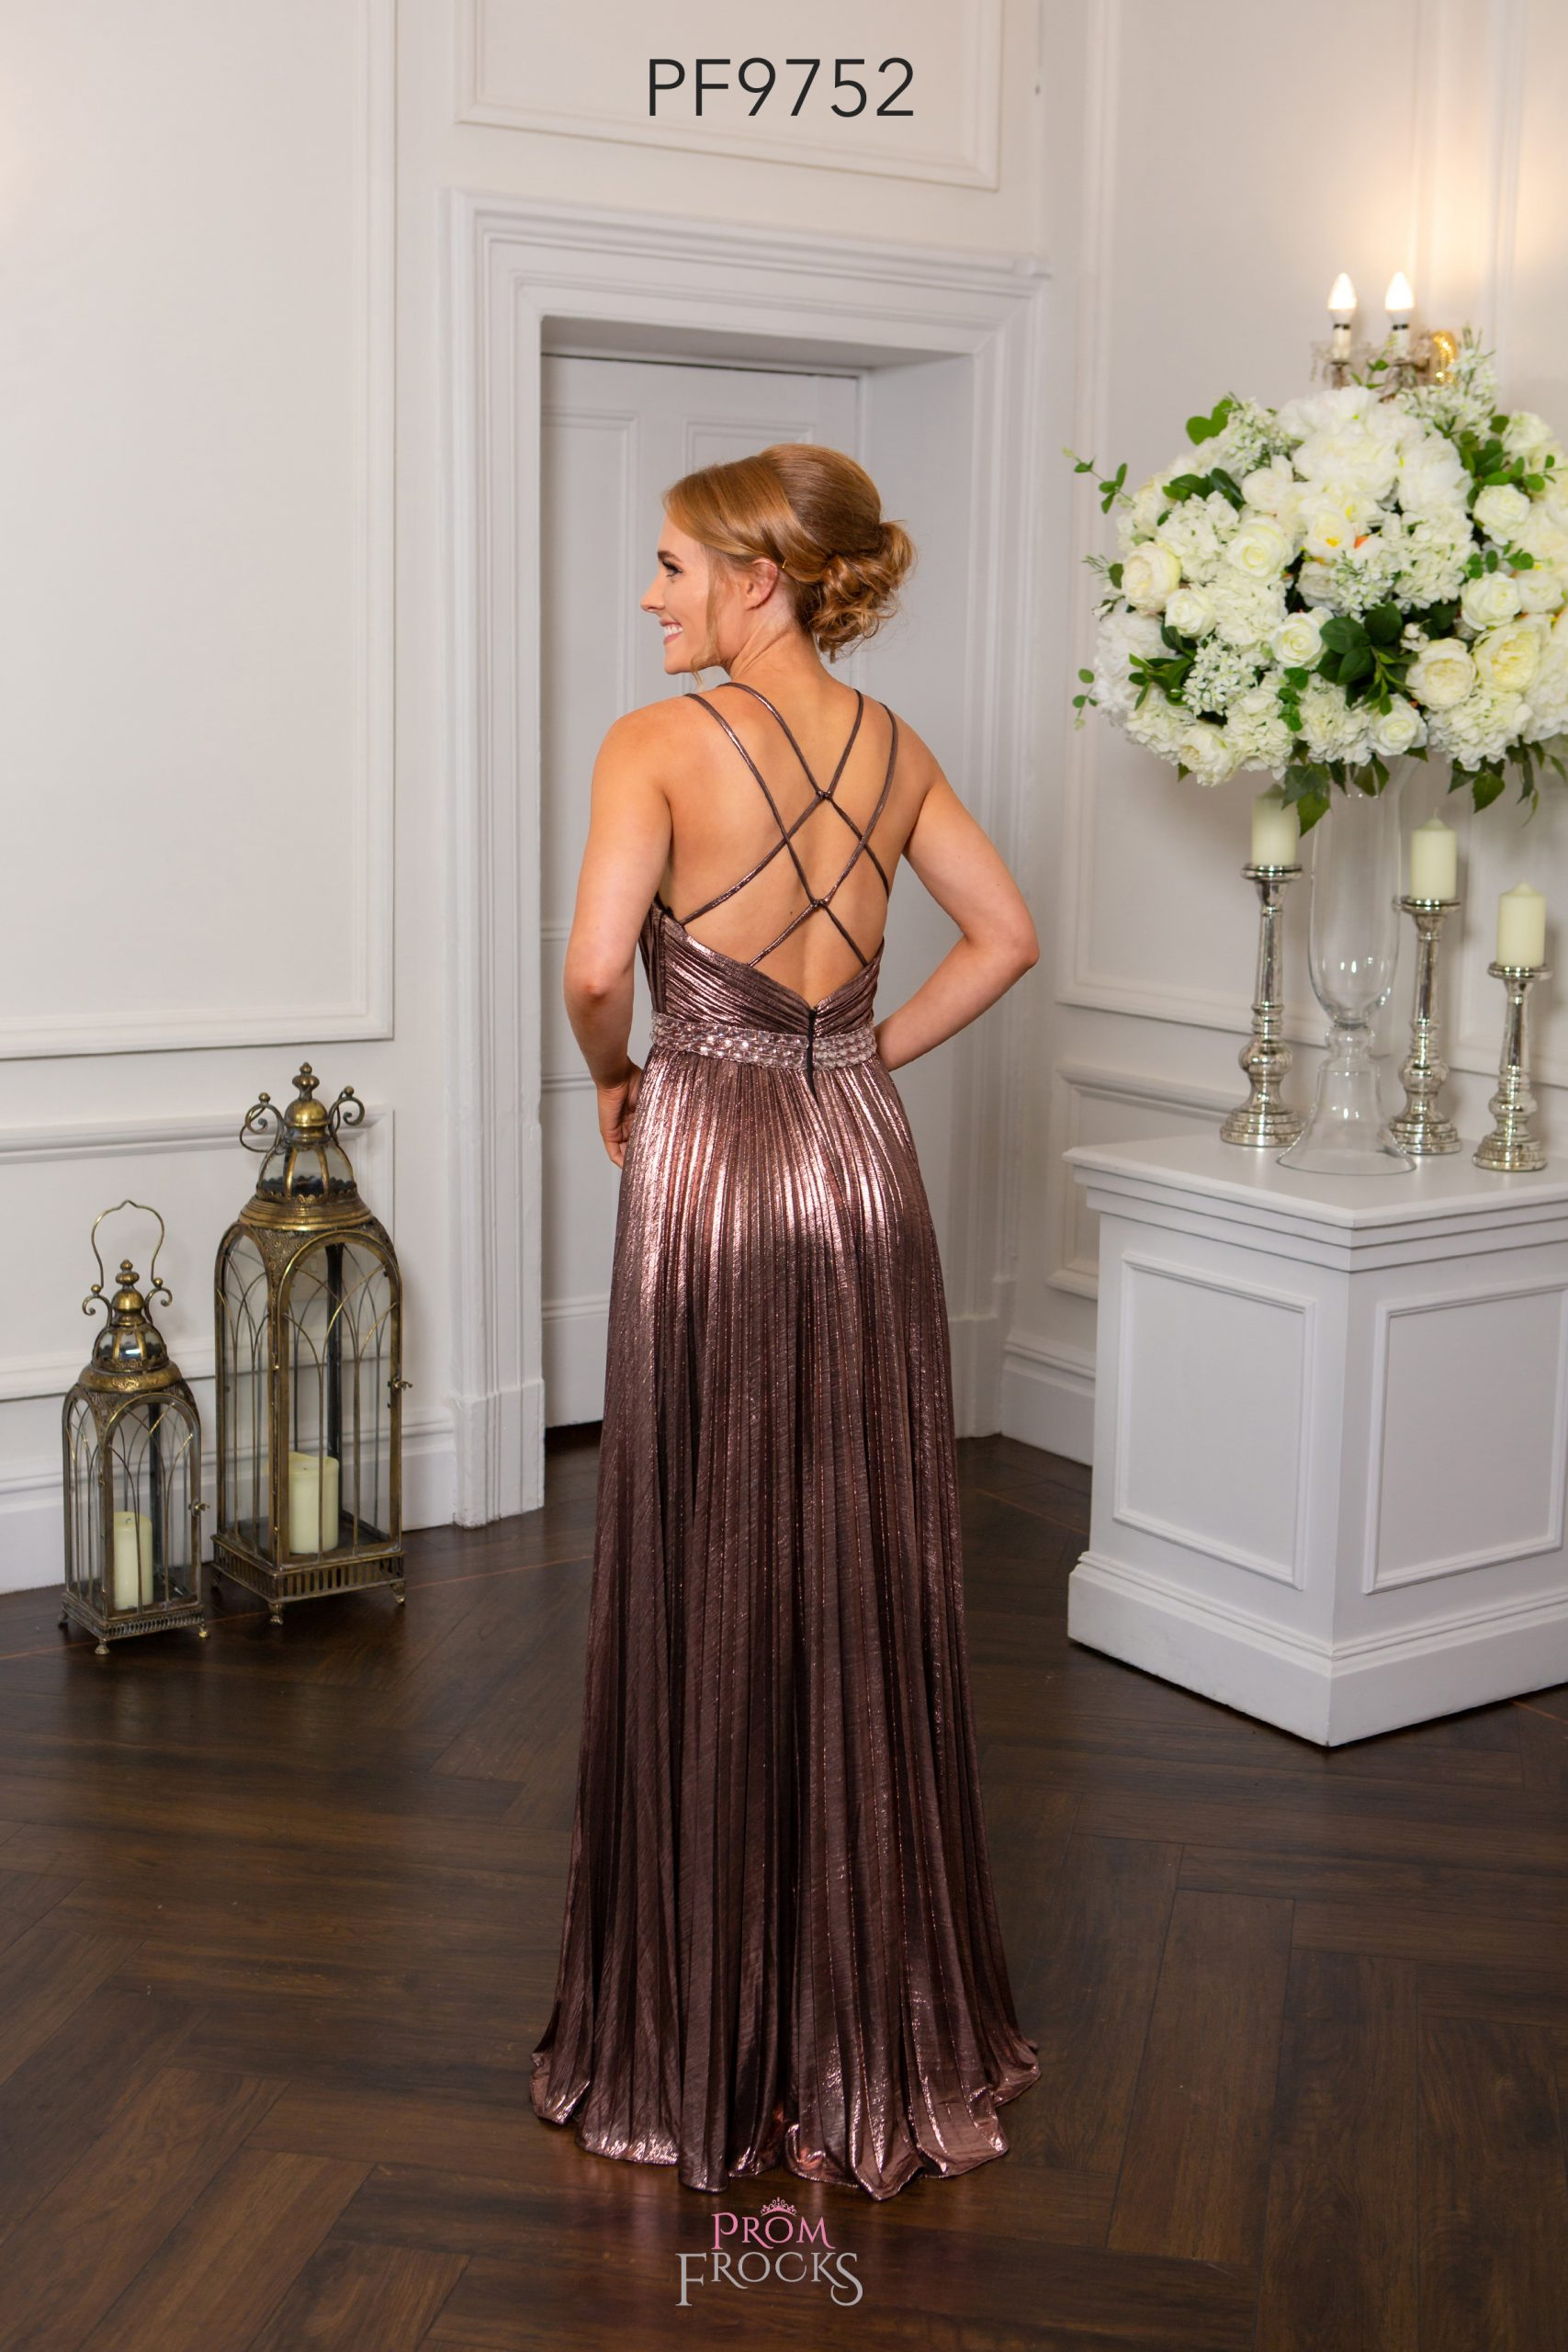 PF9752 NUDE PINK PROM/EVENING DRESS - Prom Frocks UK Prom